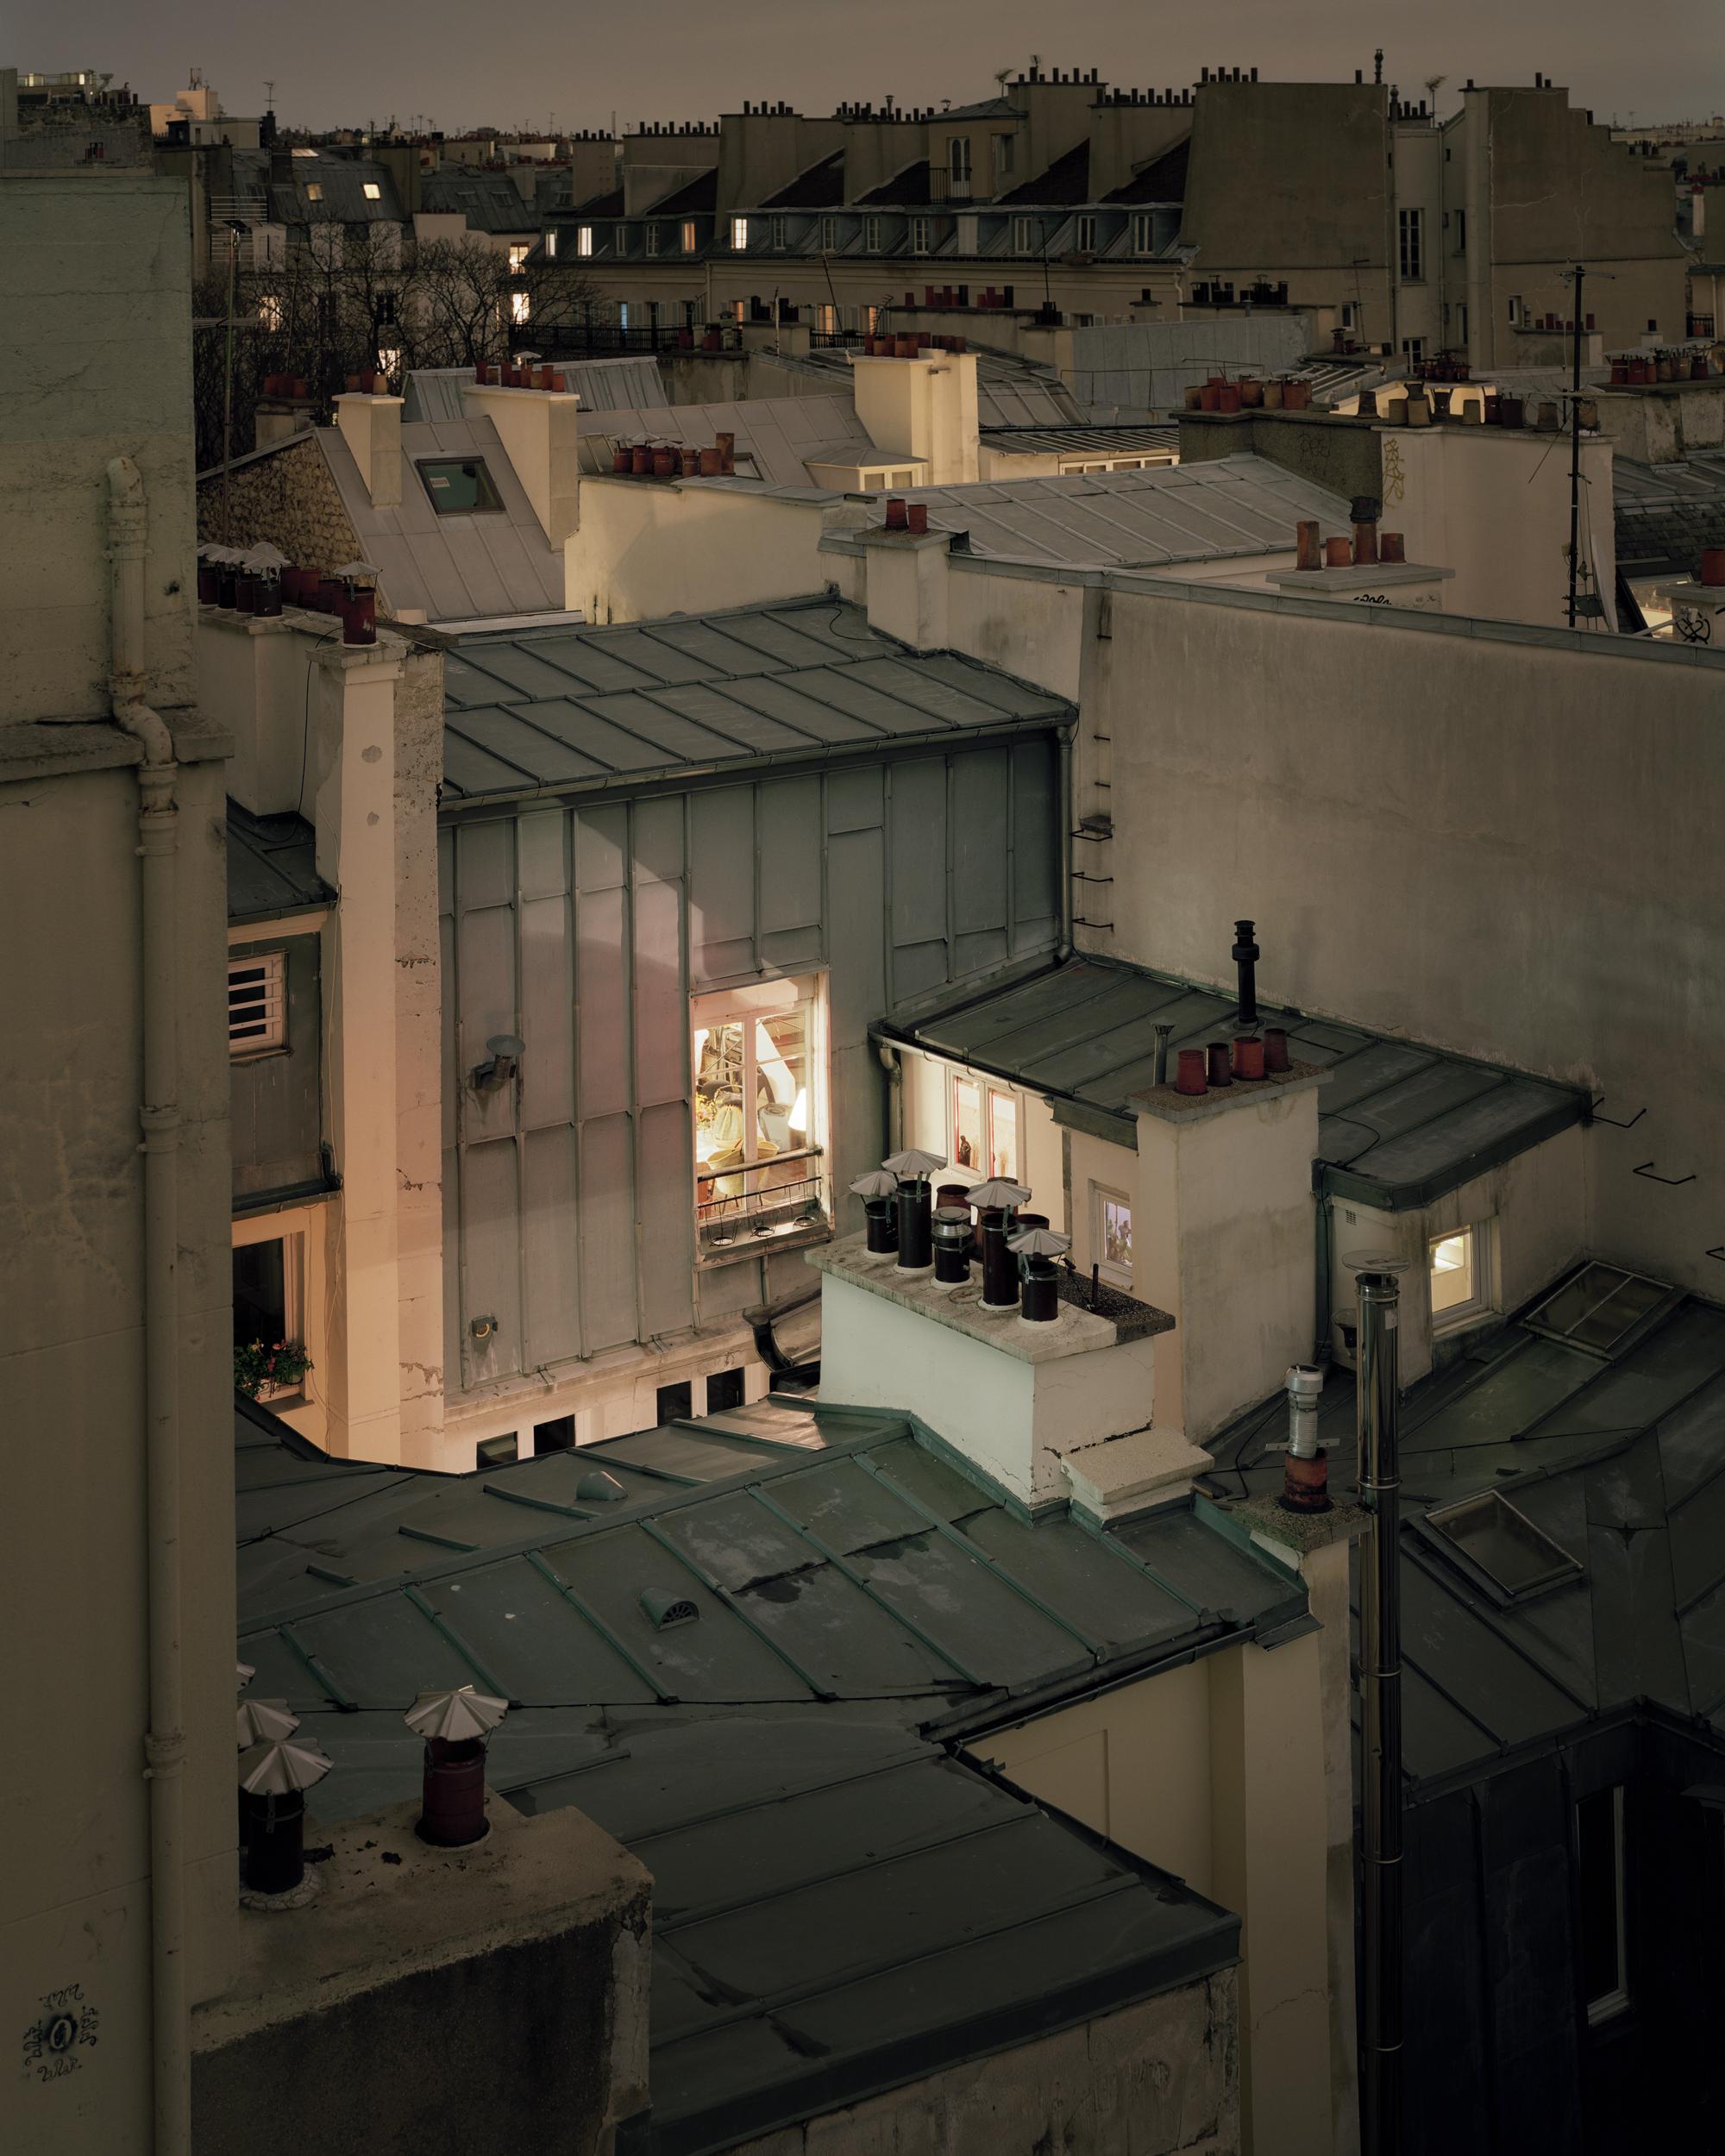 alain-cornu-paris-rooftops2